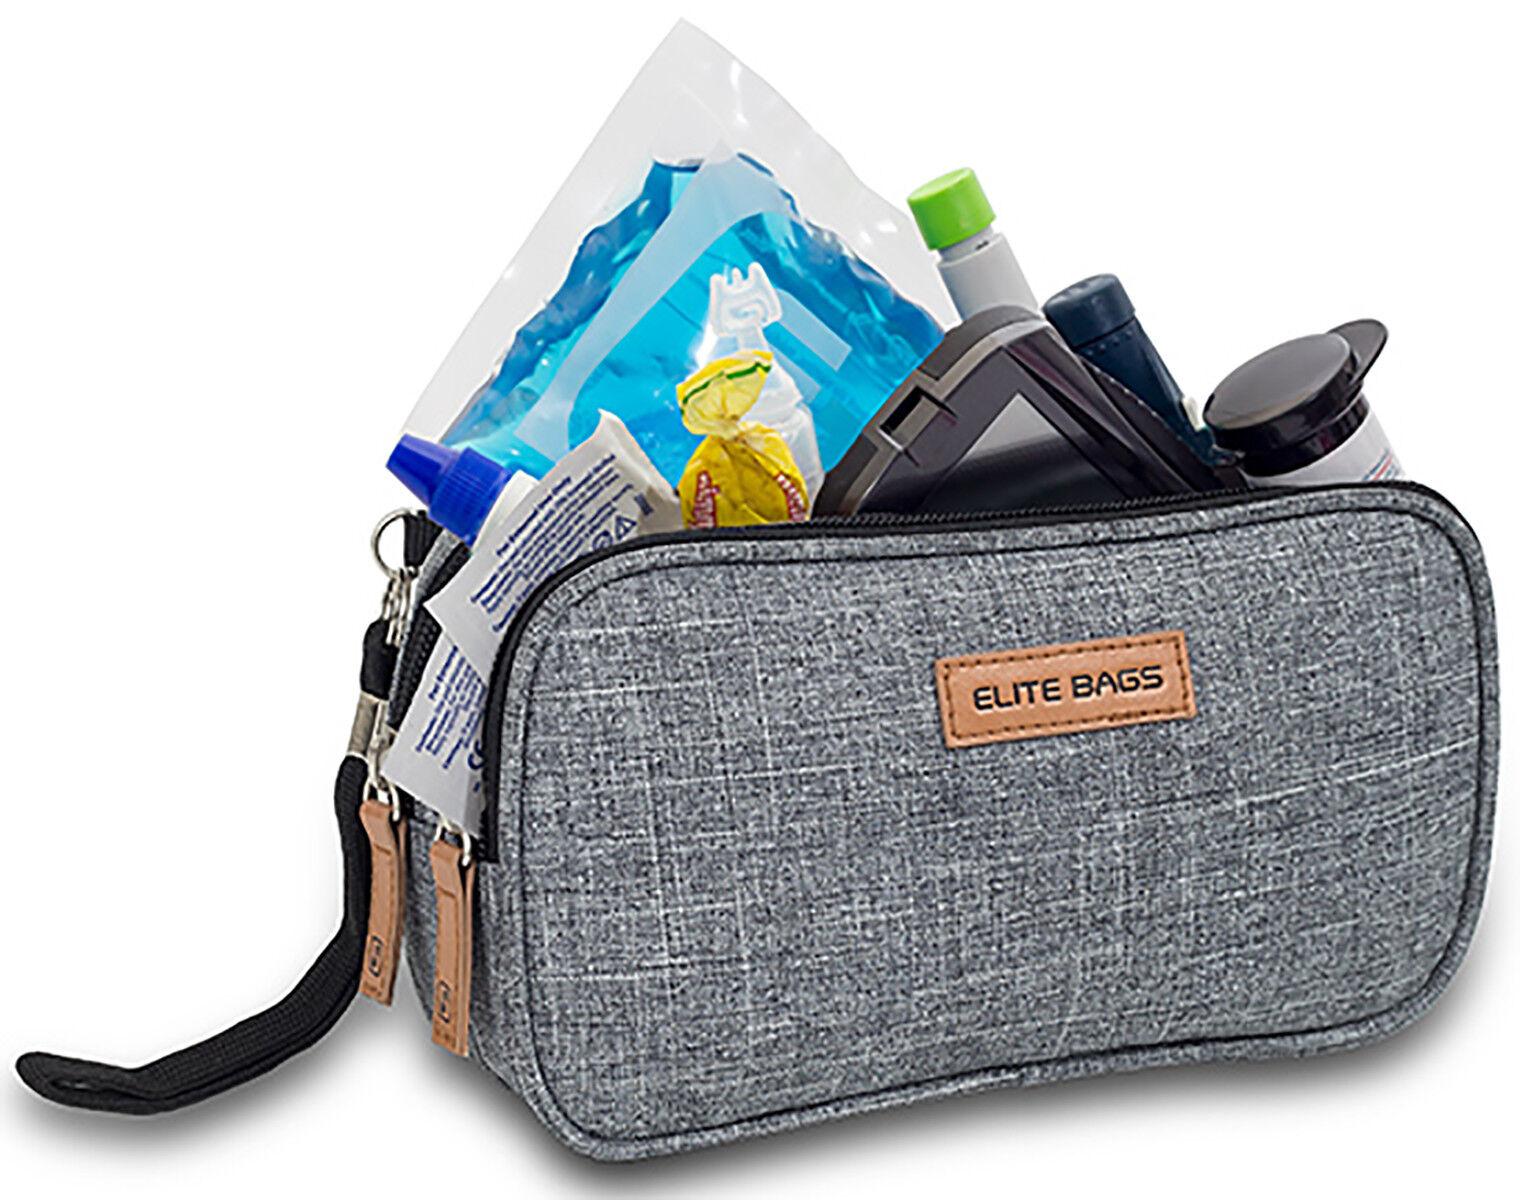 Tee-uu EliteBags Dia's Bitone Diabetikertäschchen BZ-Tasche Diabetikertasche